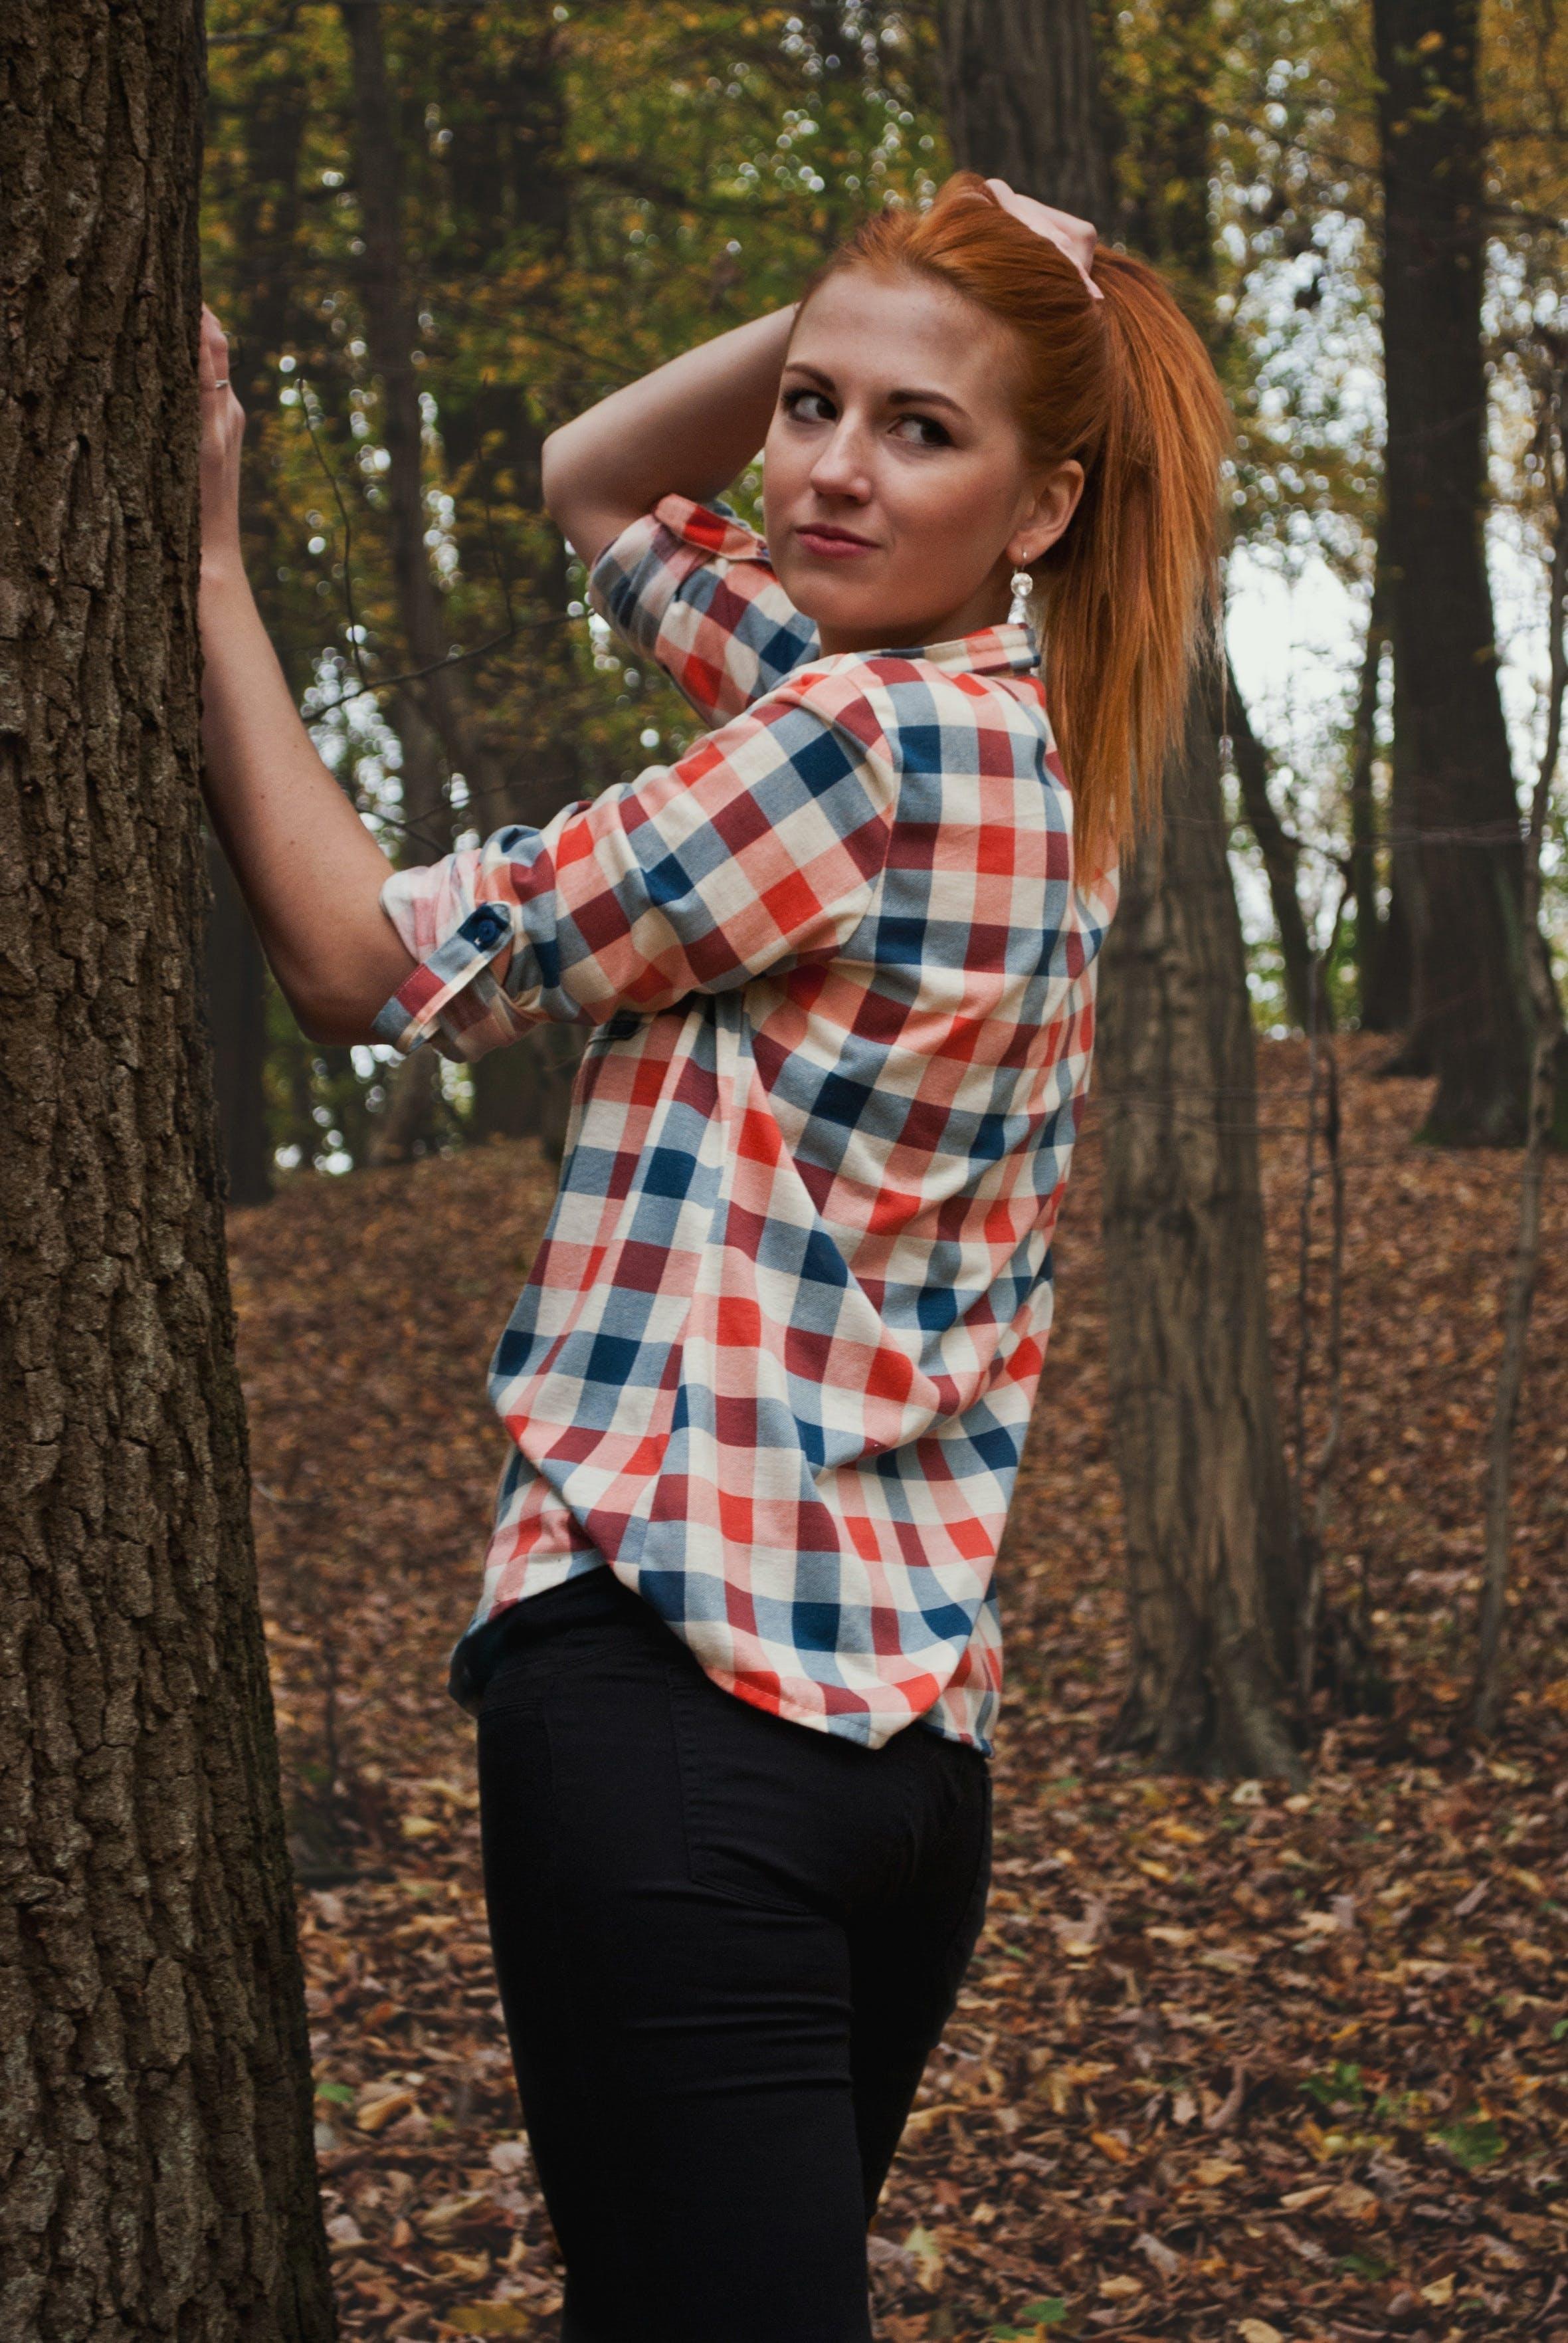 Free stock photo of girl, forest, jacket, autumn